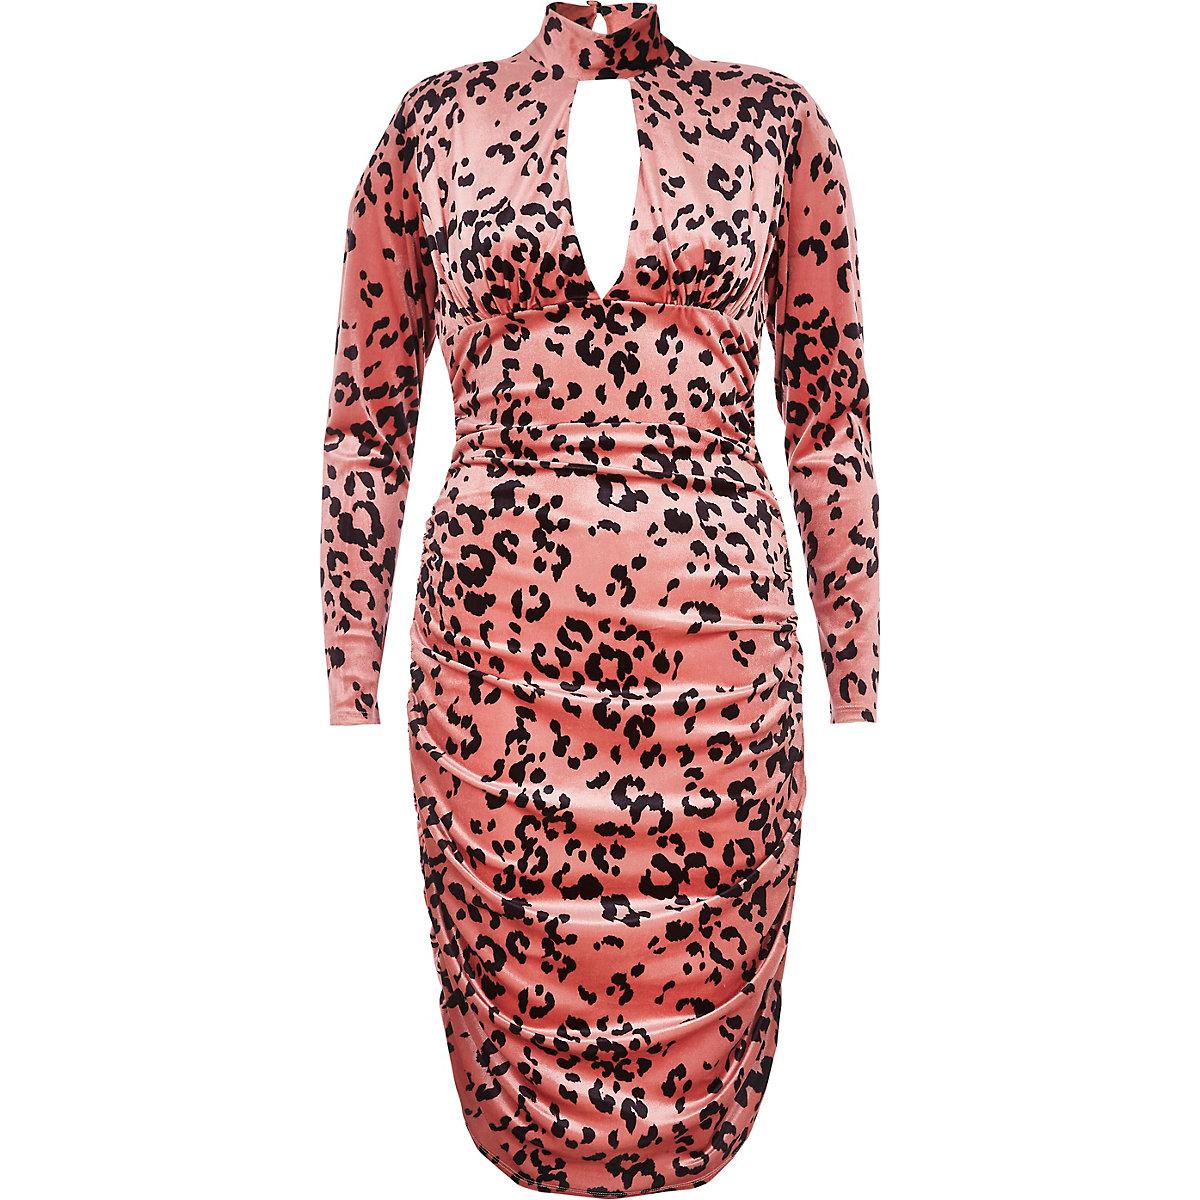 Pink leopard print ruched bodycon dress - Bodycon Dresses - Dresses ... 6a07c233e